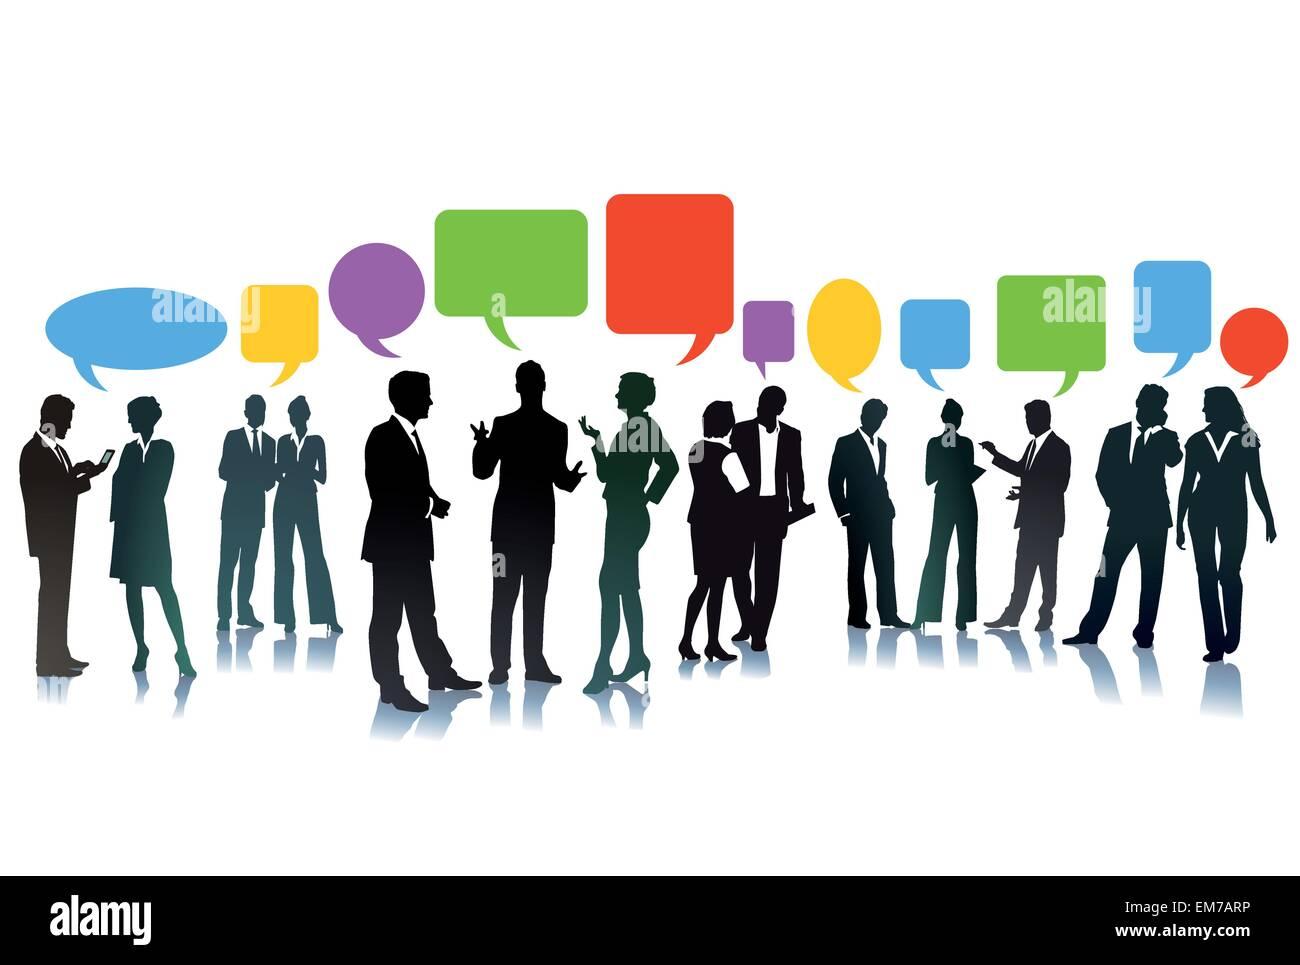 Unternehmensbörse der Ideen Stockbild